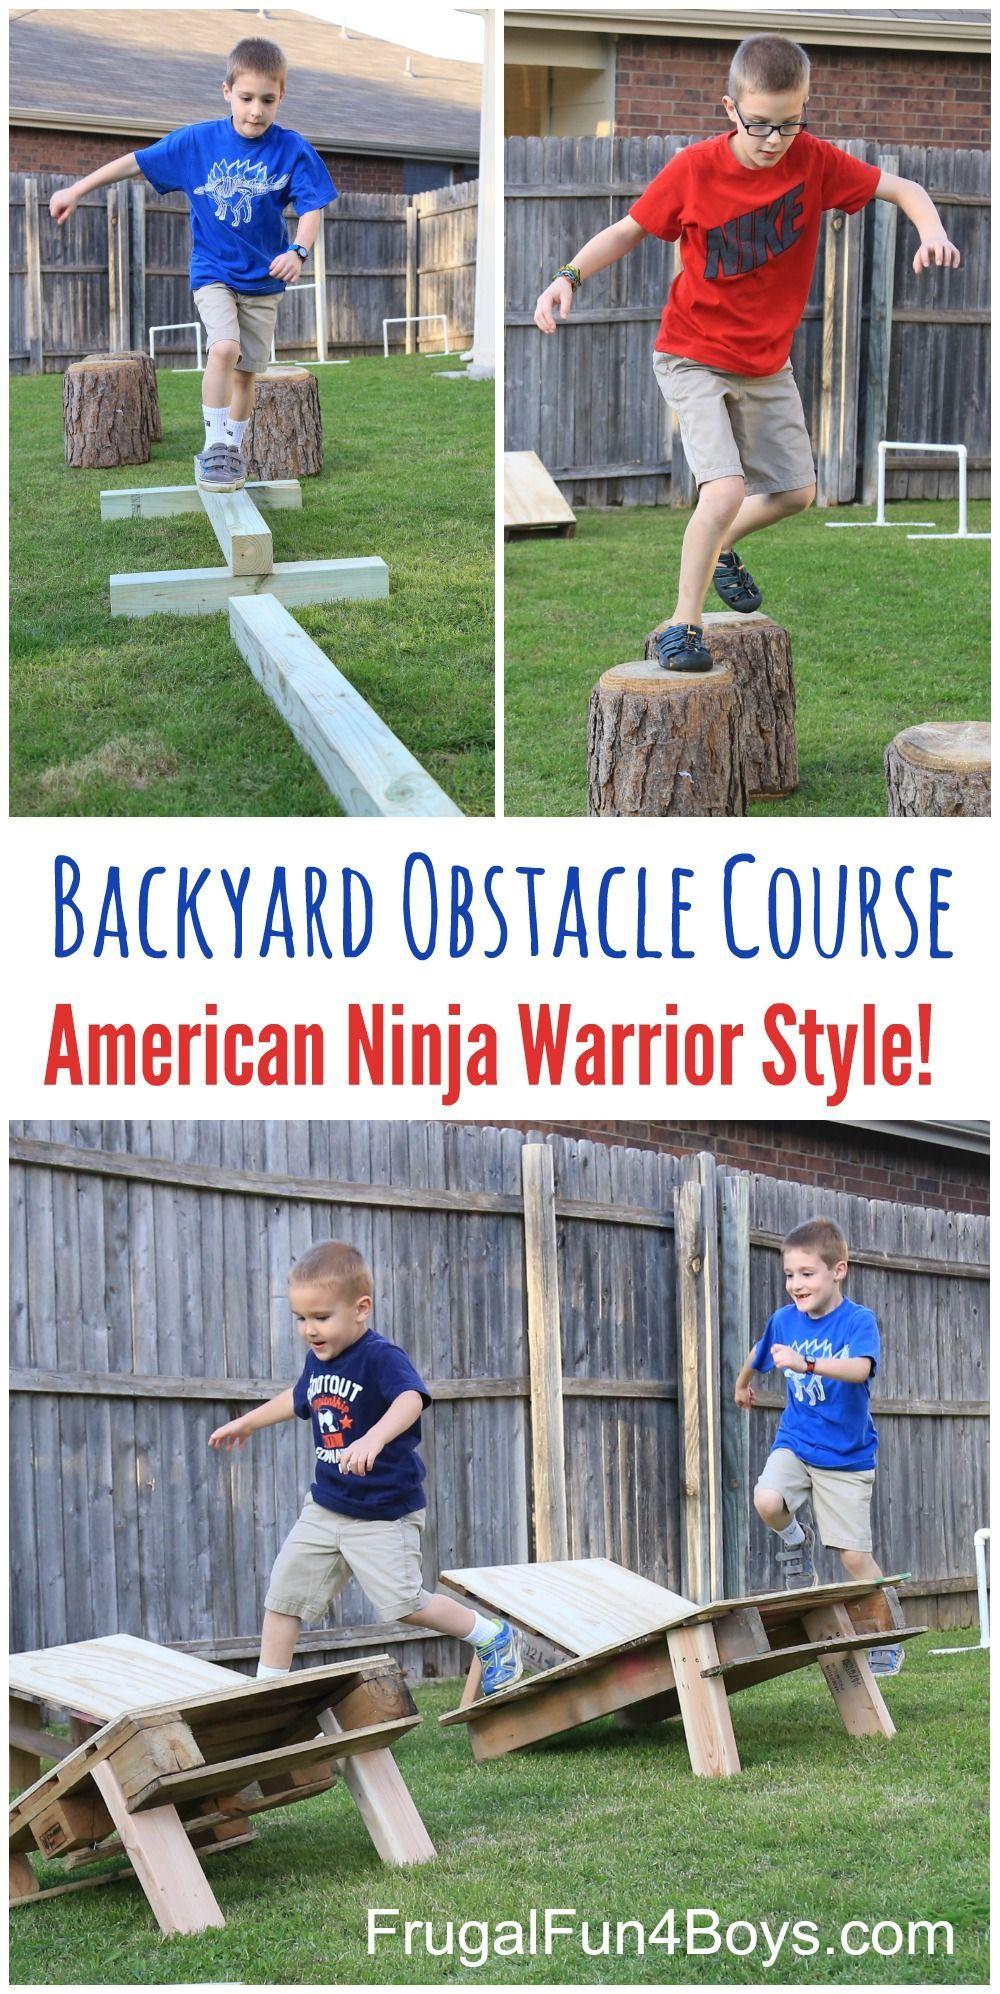 30 Genius Tricks Of How To Upgrade Backyard Obstacle Course Ideas Simphome Backyard Obstacle Course Kids Obstacle Course Backyard For Kids